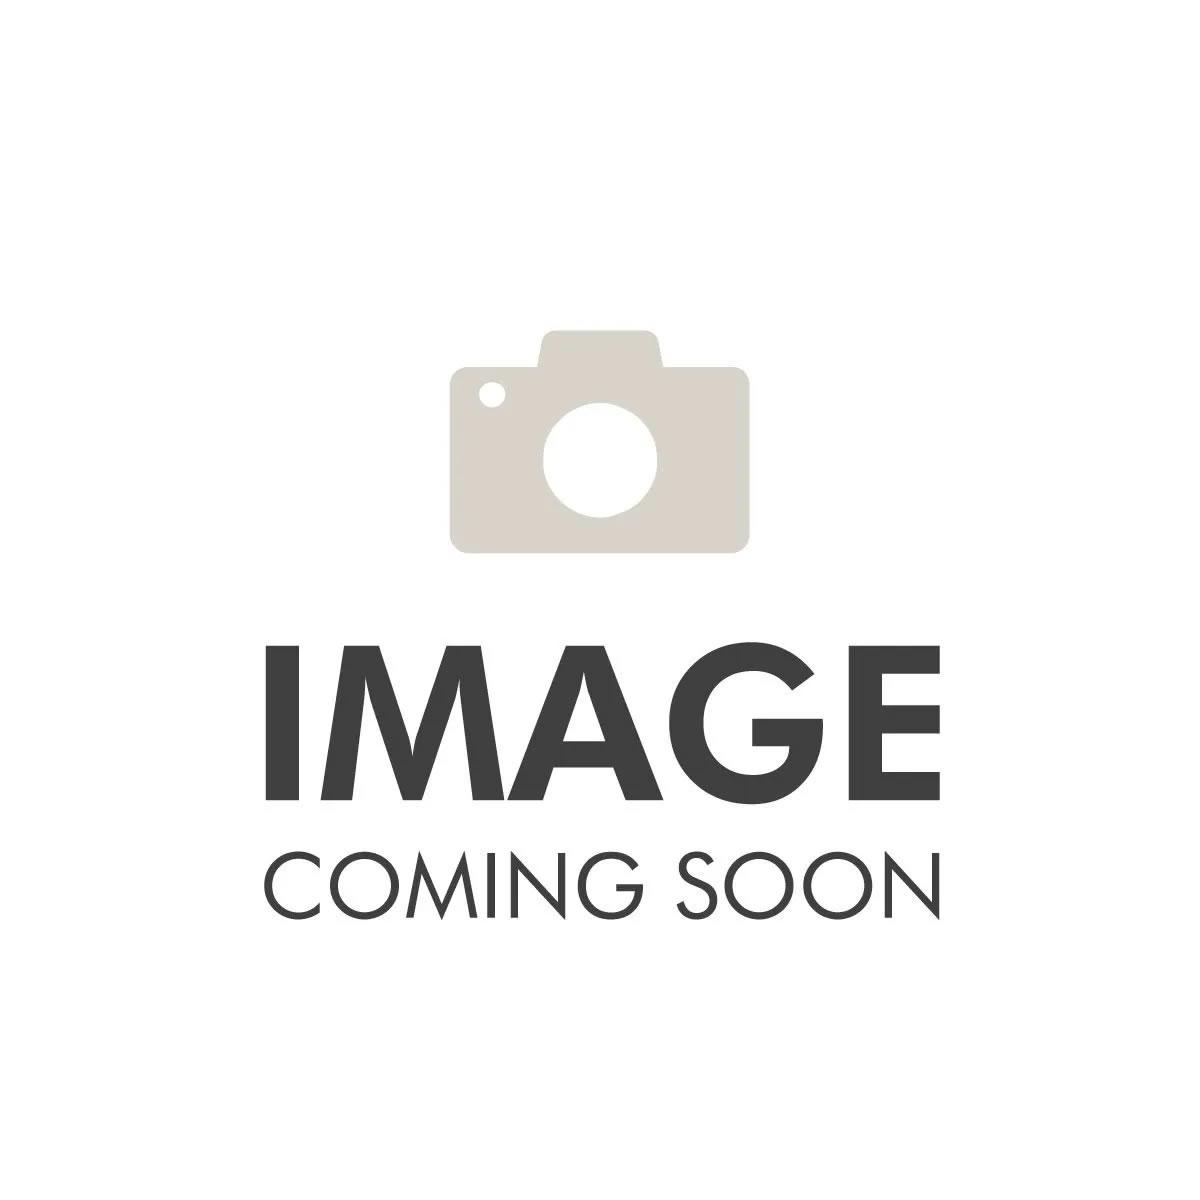 Soft Top, White Denim, Clear Windows; 86-95 Suzuki Samurai